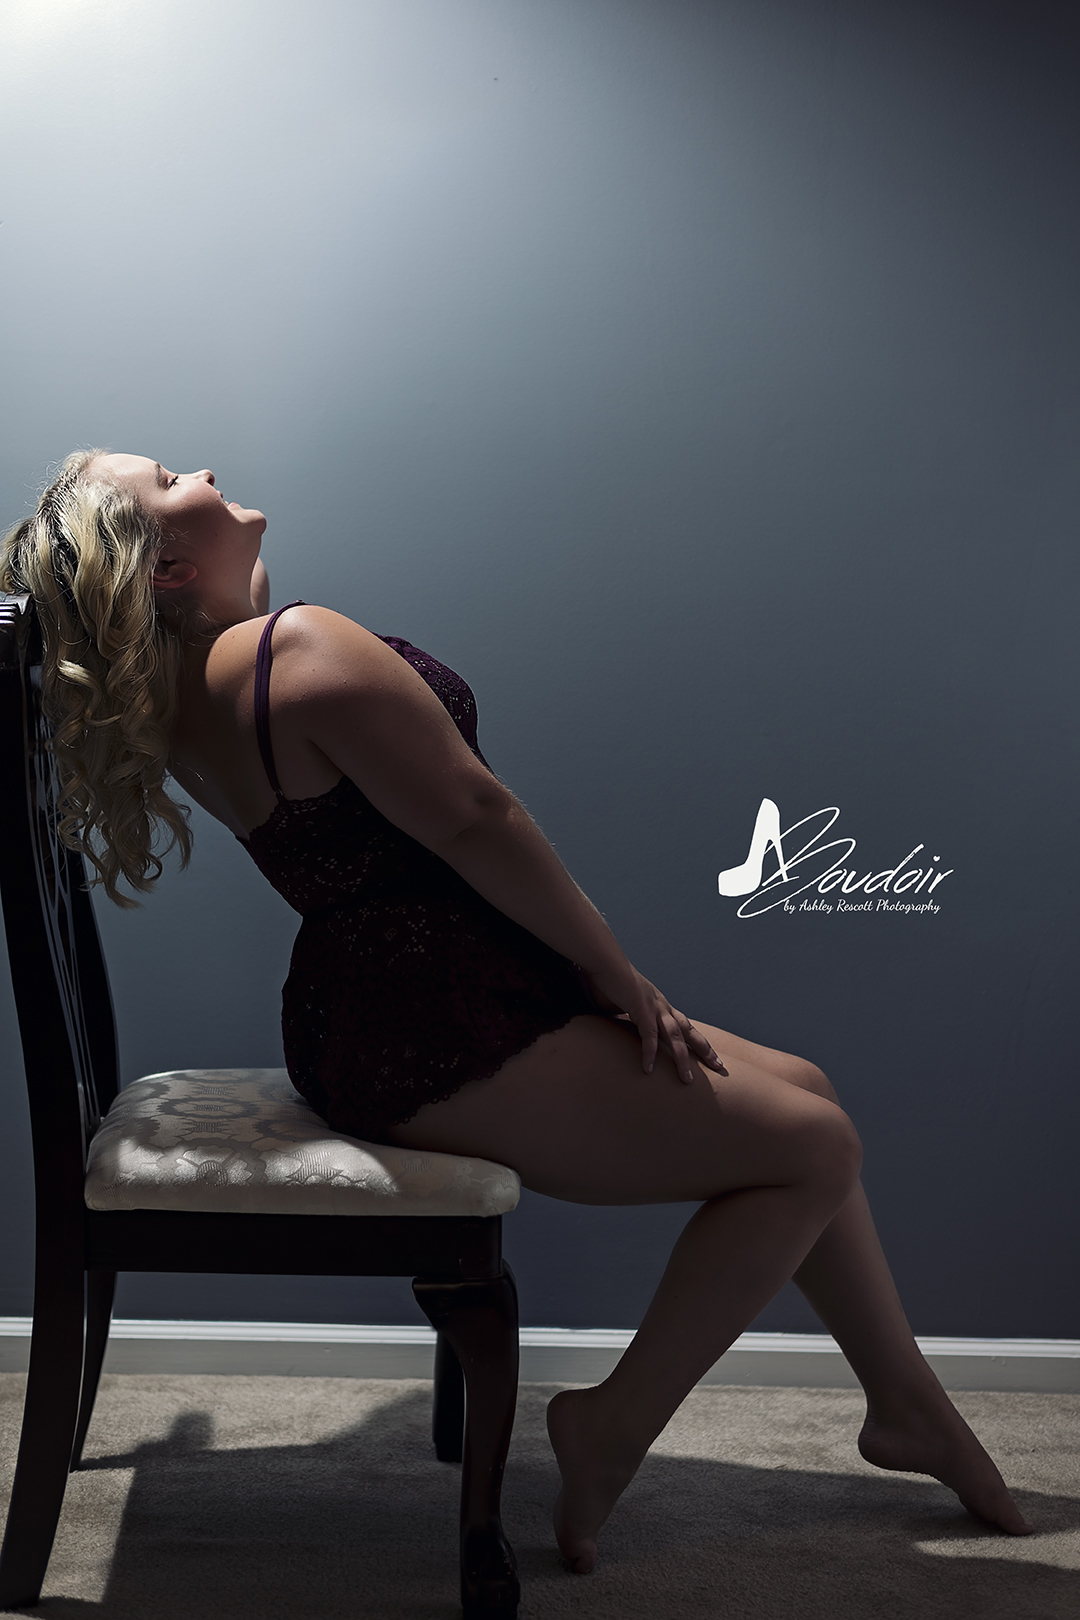 blonde bombshell on chair